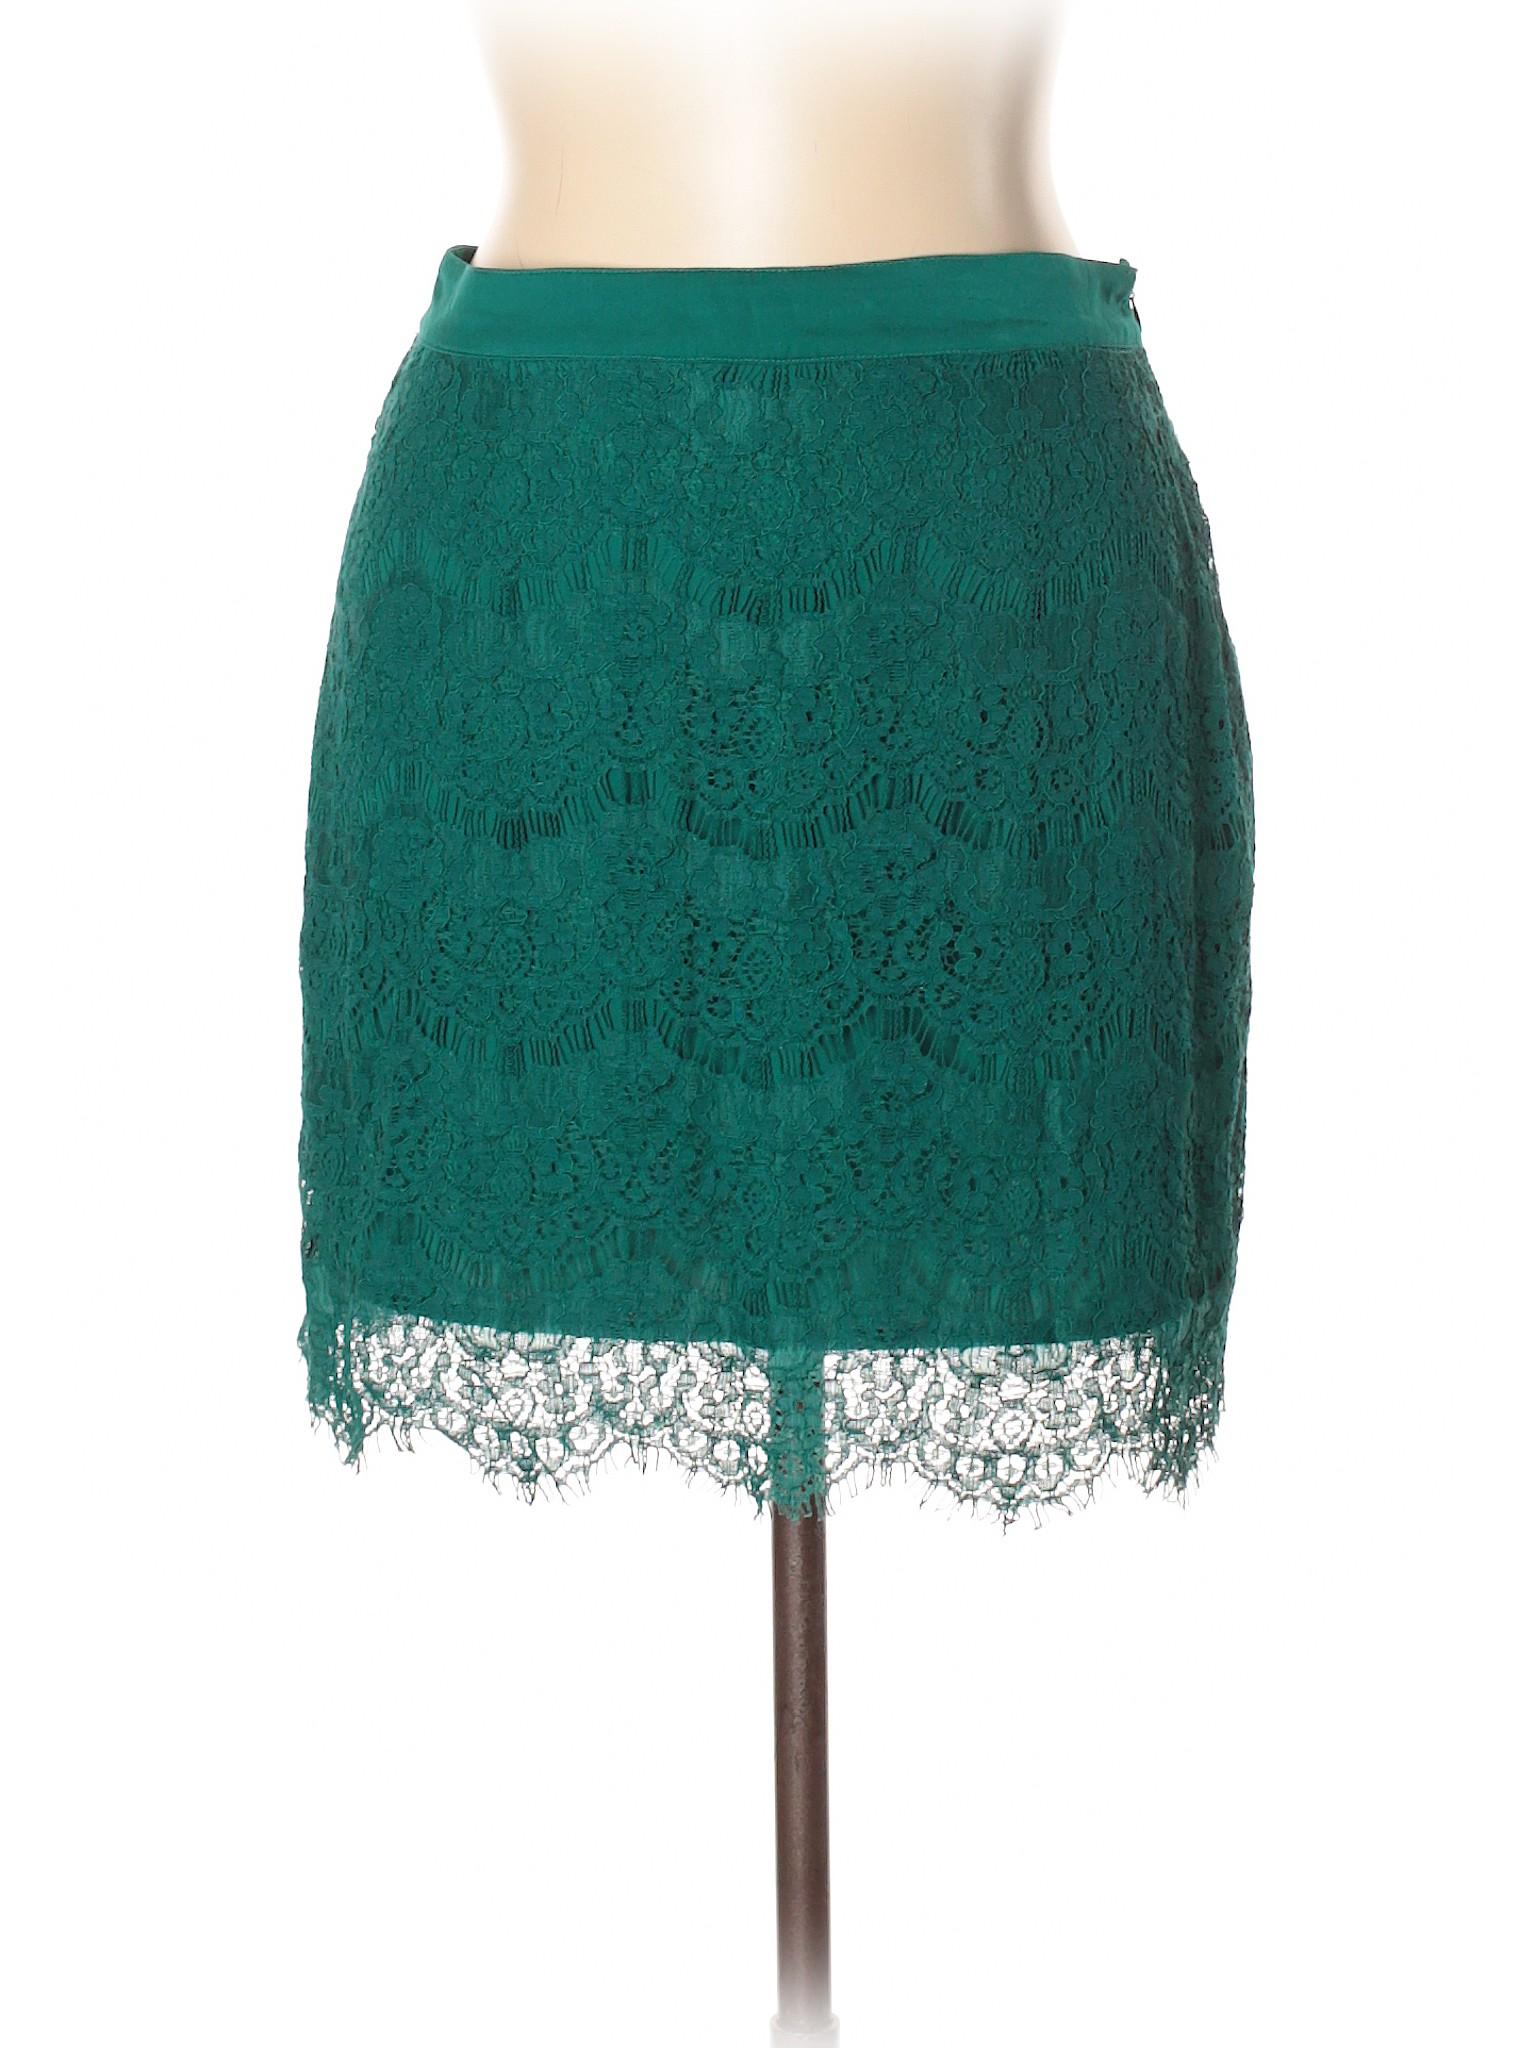 Casual Casual Skirt Skirt Boutique Casual Skirt Boutique Boutique Casual Casual Skirt Boutique Boutique Skirt RWRzxwqUr